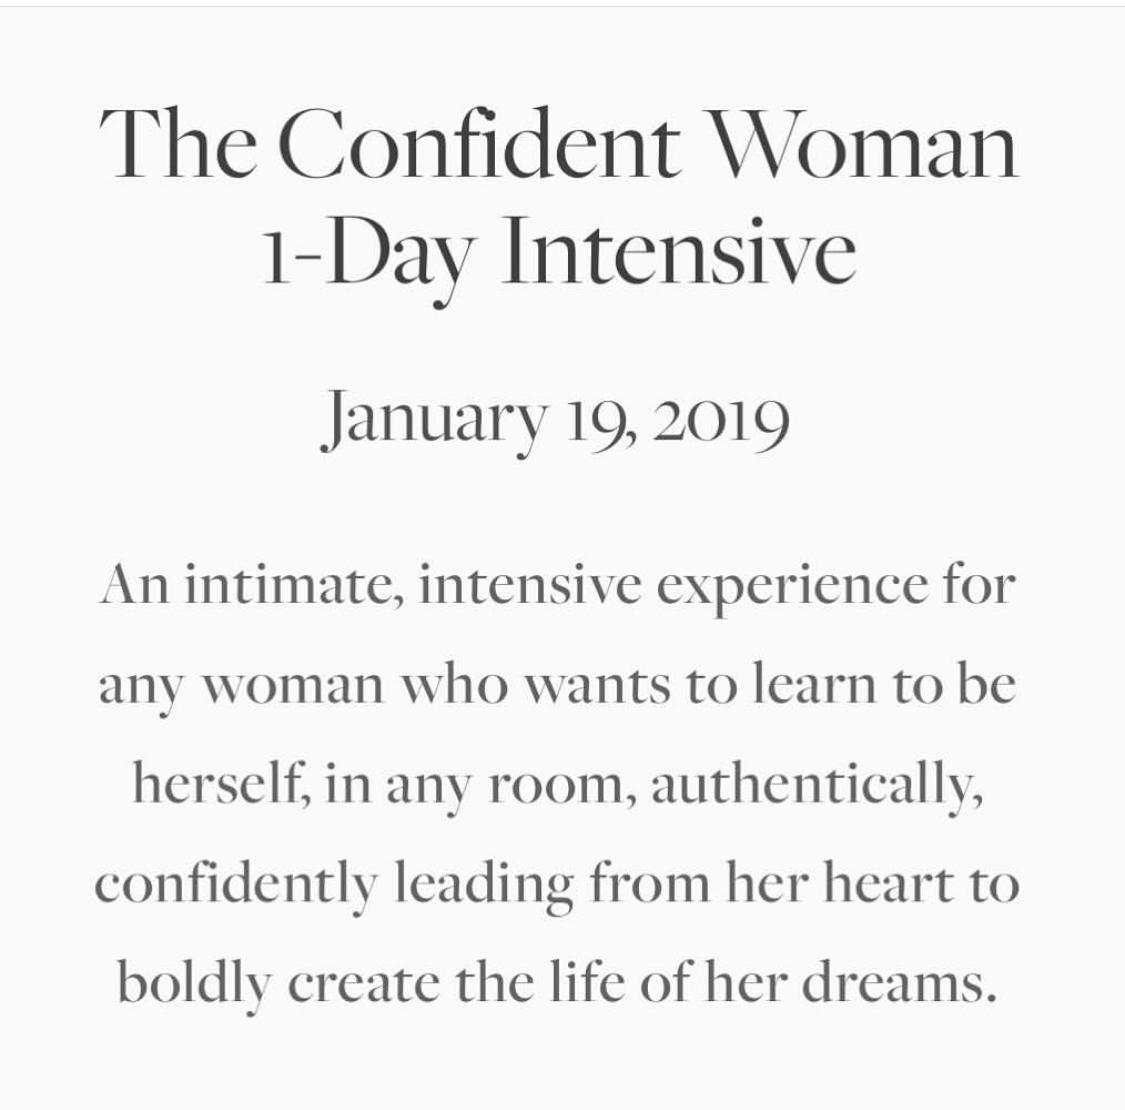 TheConfidentWomanIntensive-TJV-ad.jpg